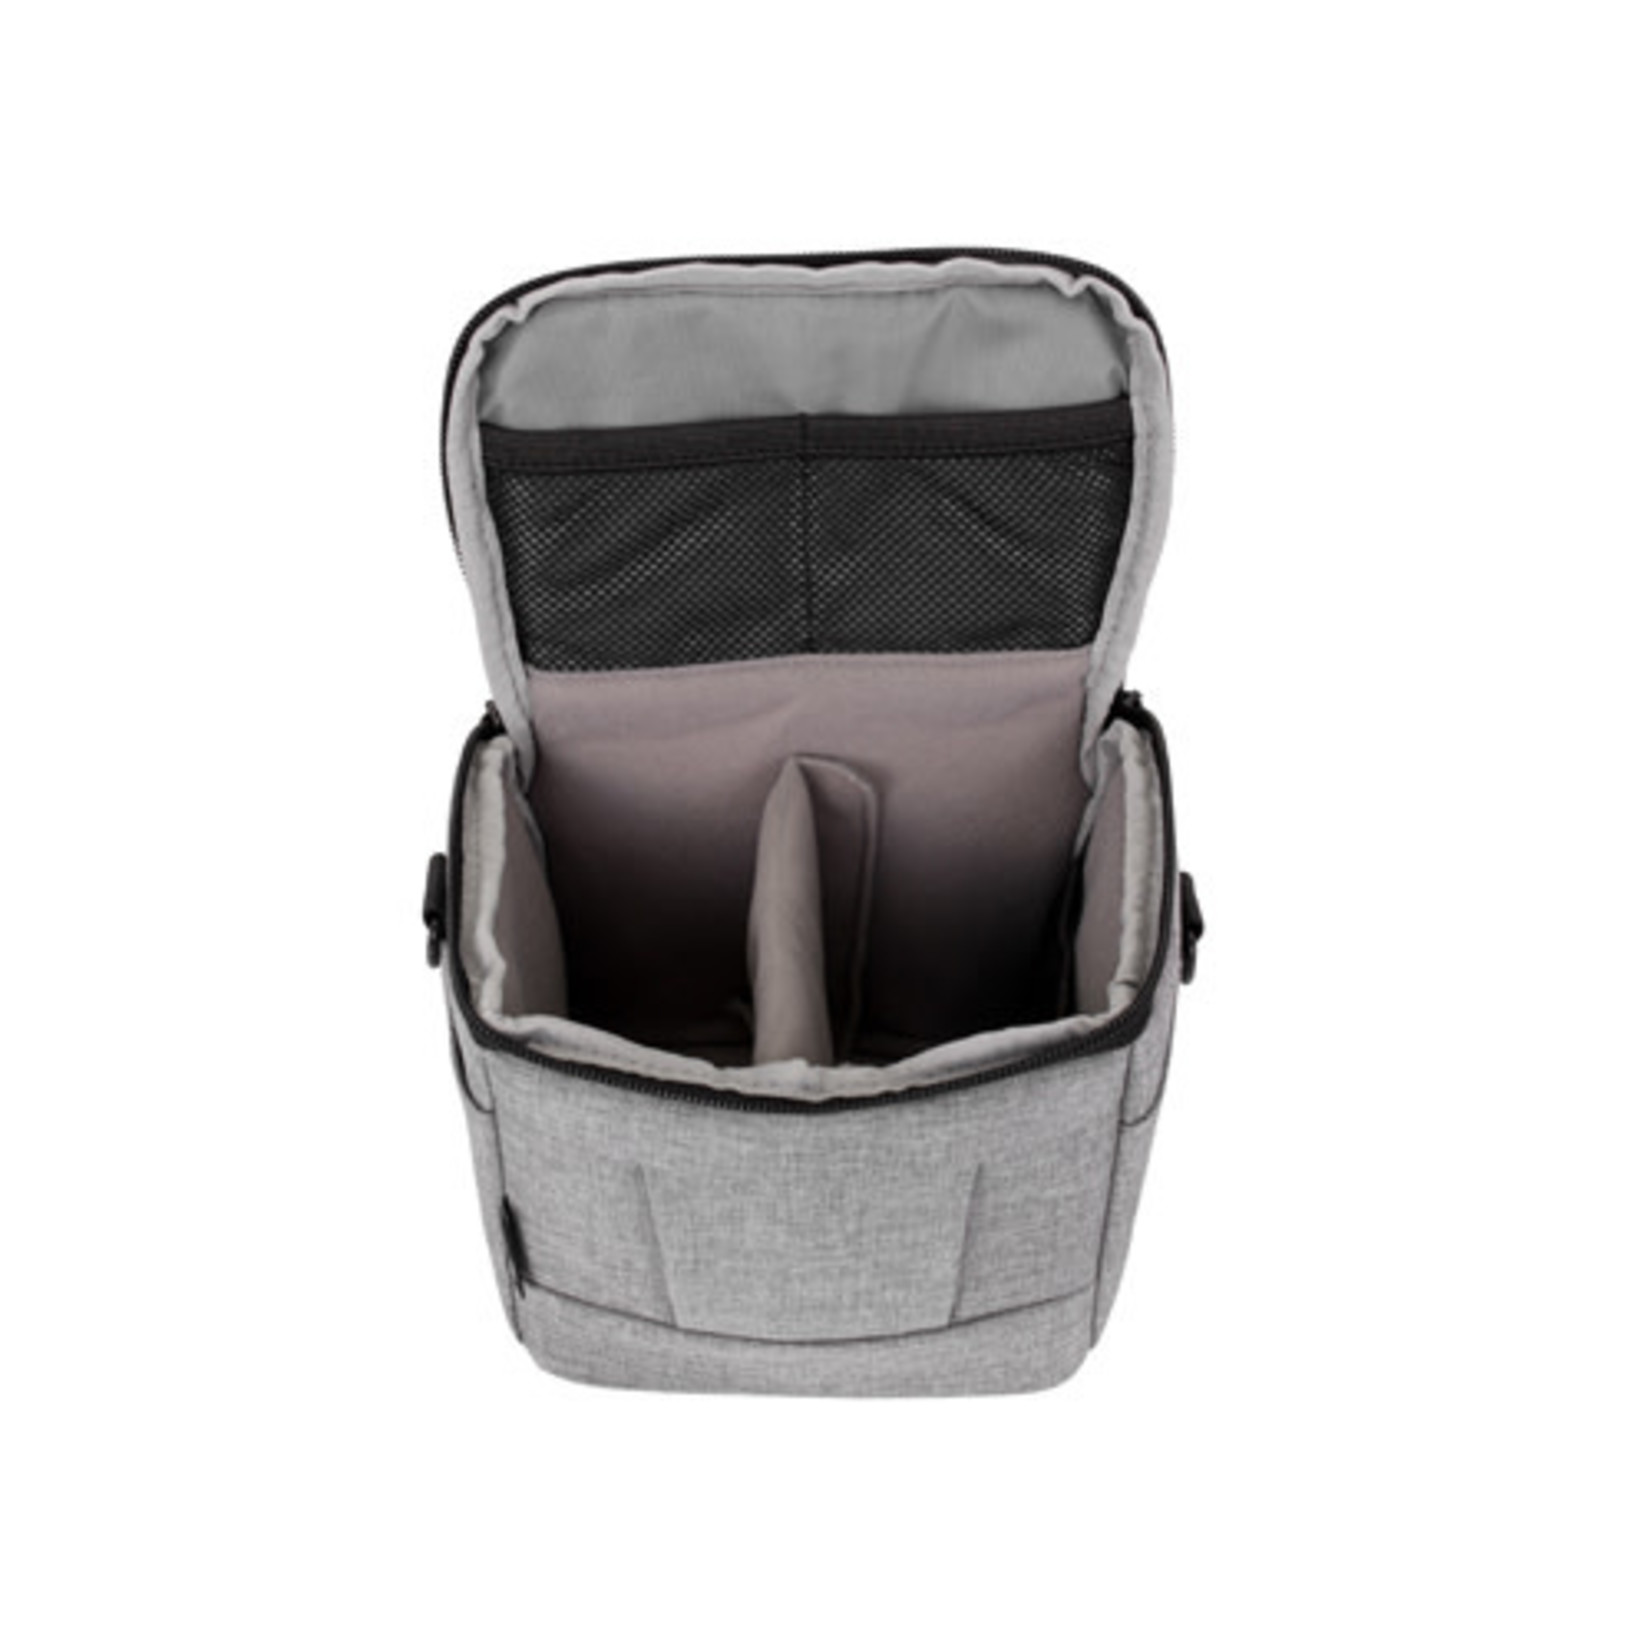 ProMaster Impulse Small Shoulder Bag - Grey